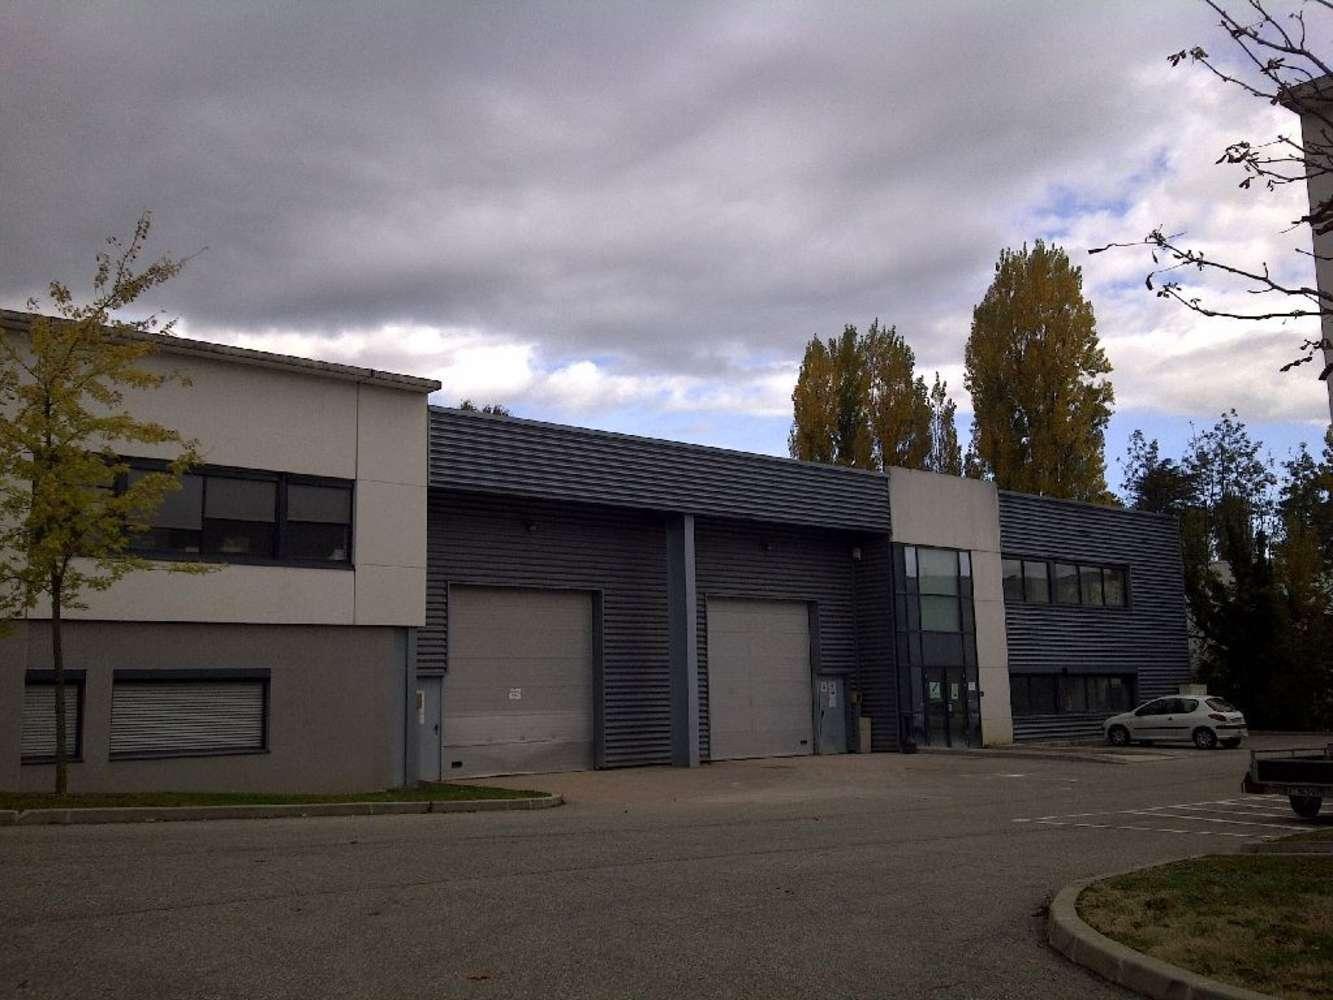 Activités/entrepôt Limonest, 69760 - Entrepot Limonest - Lyon Techlid - 10035376